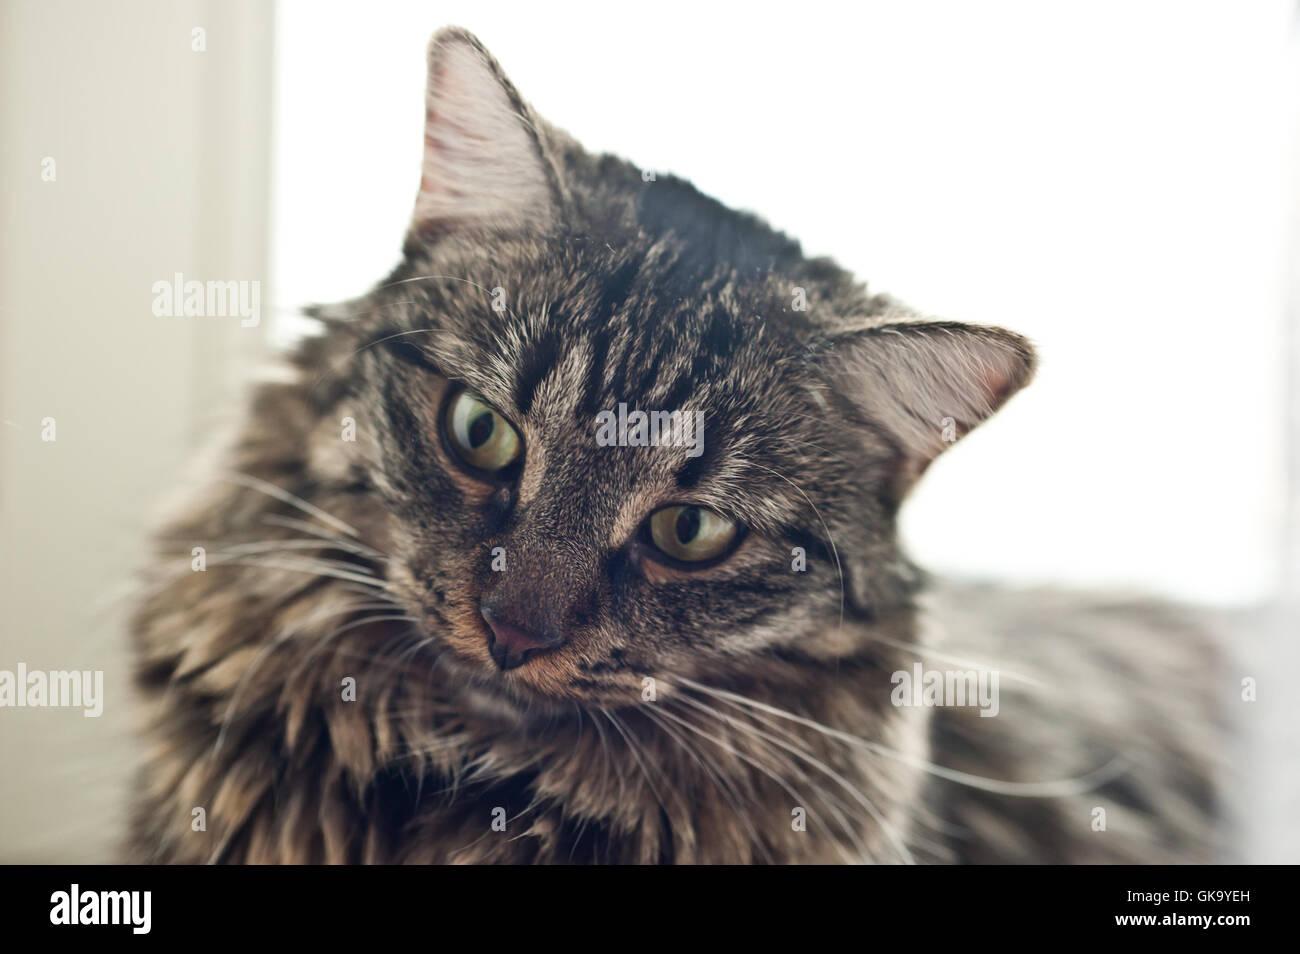 Raza de gato doméstico Foto de stock